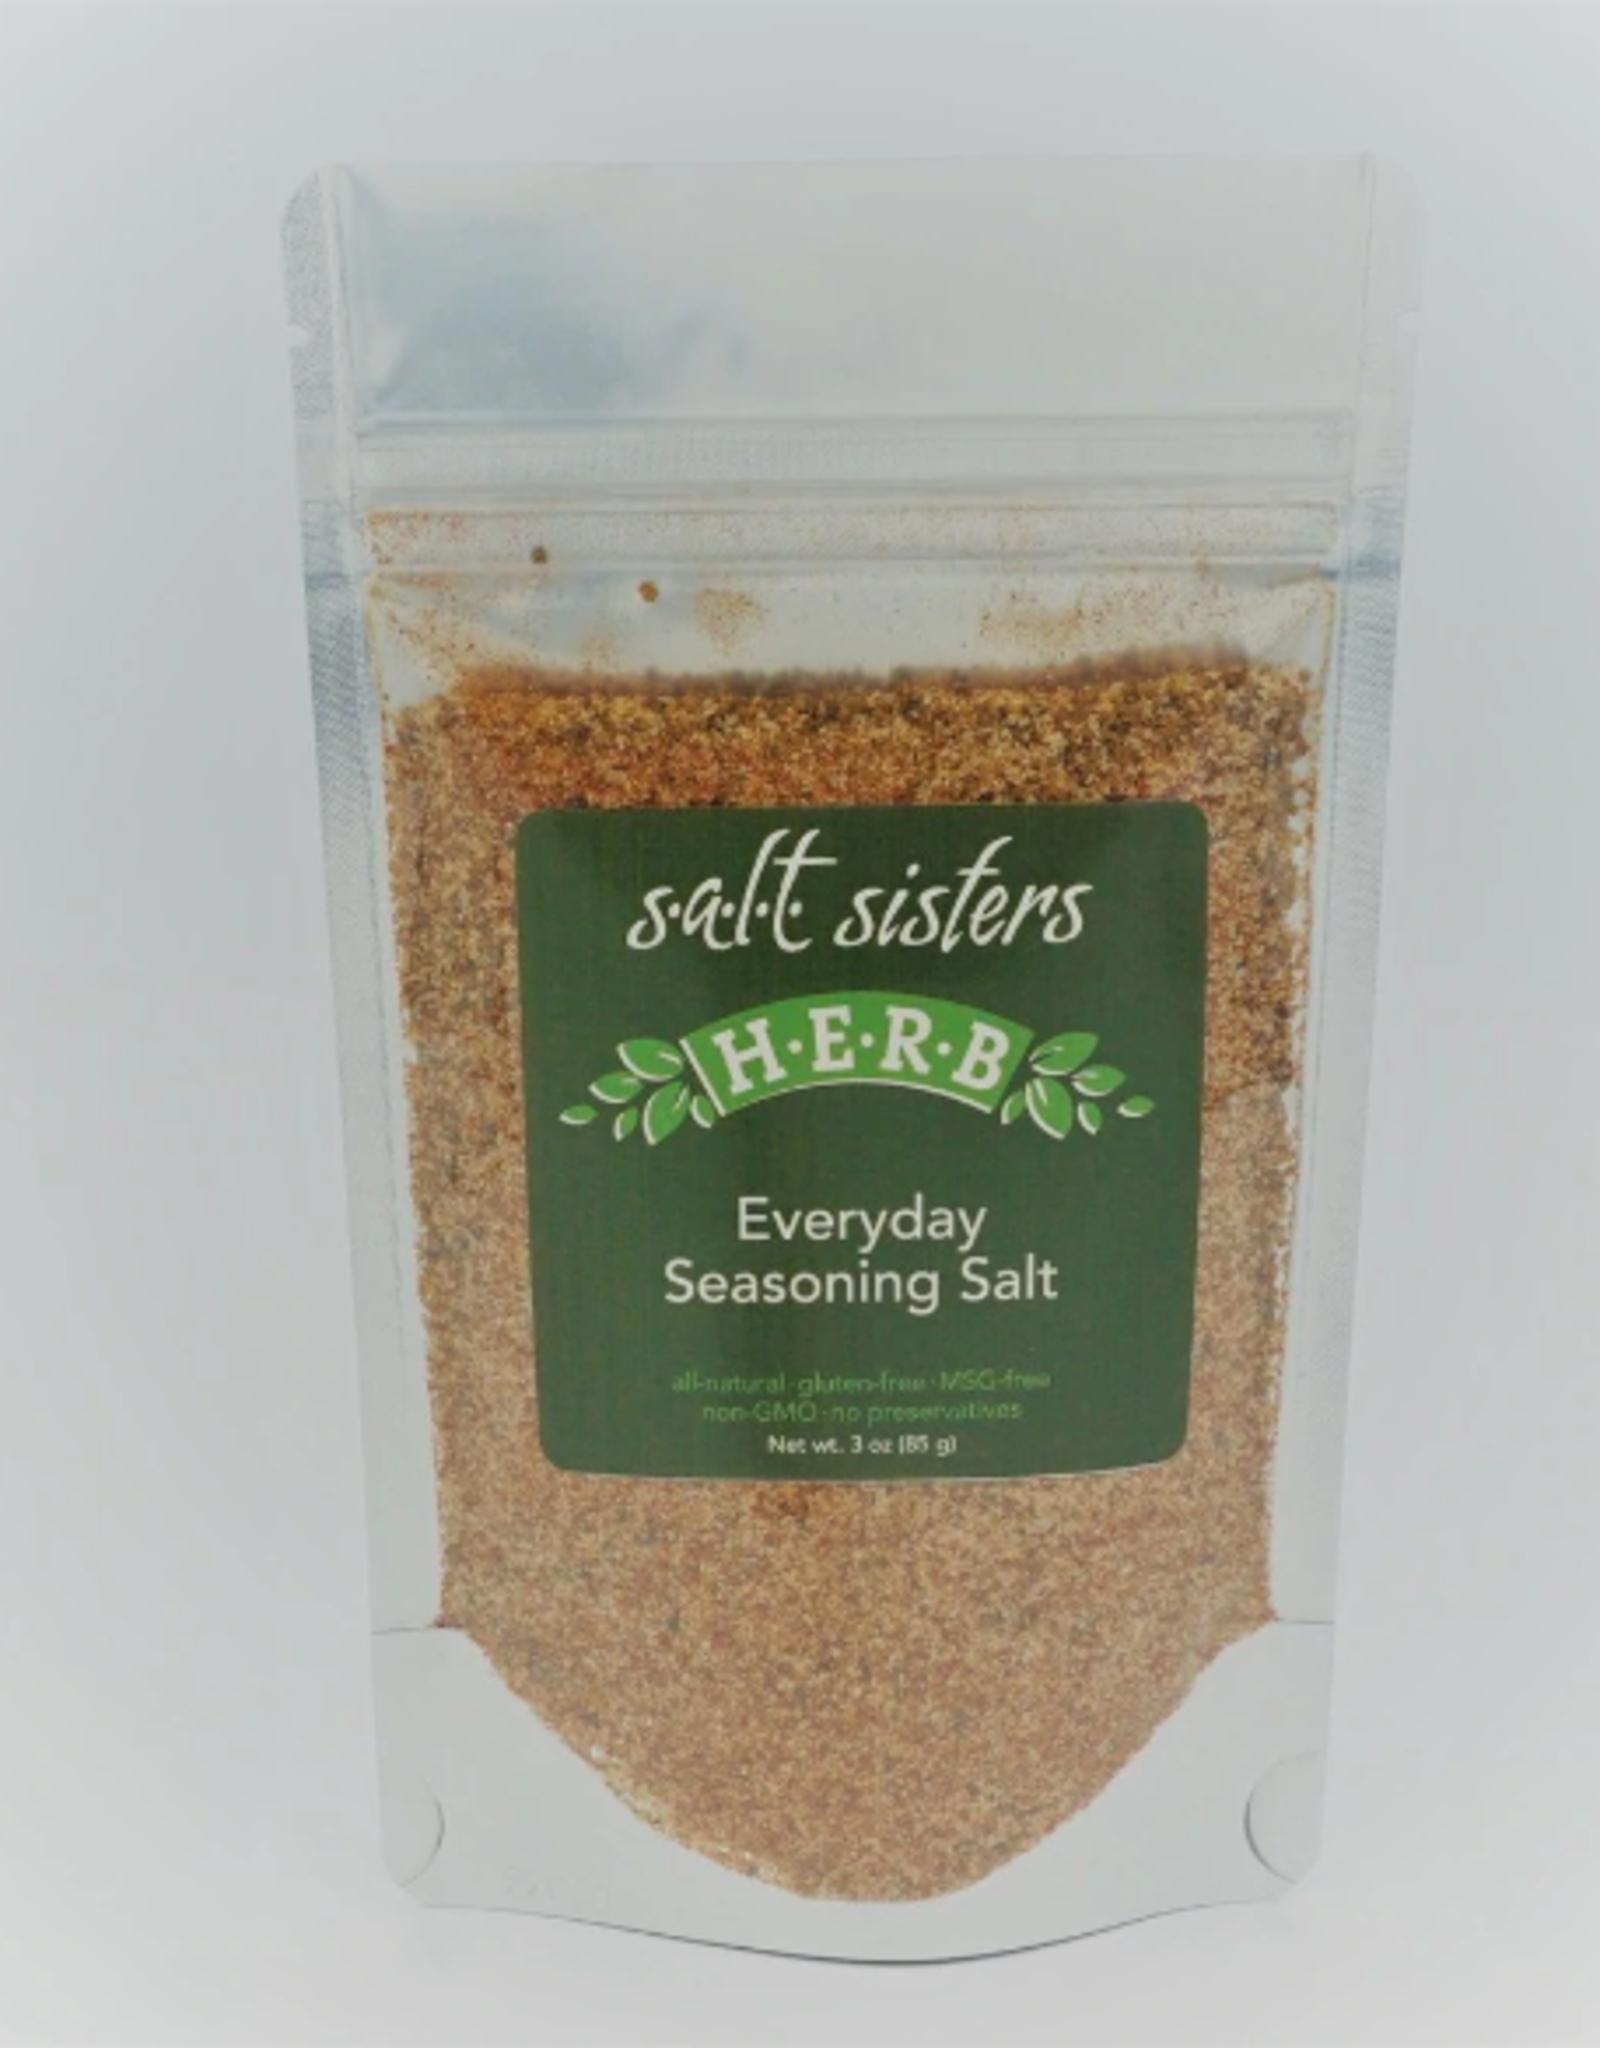 Salt Sisters Everyday Seasoning Salt